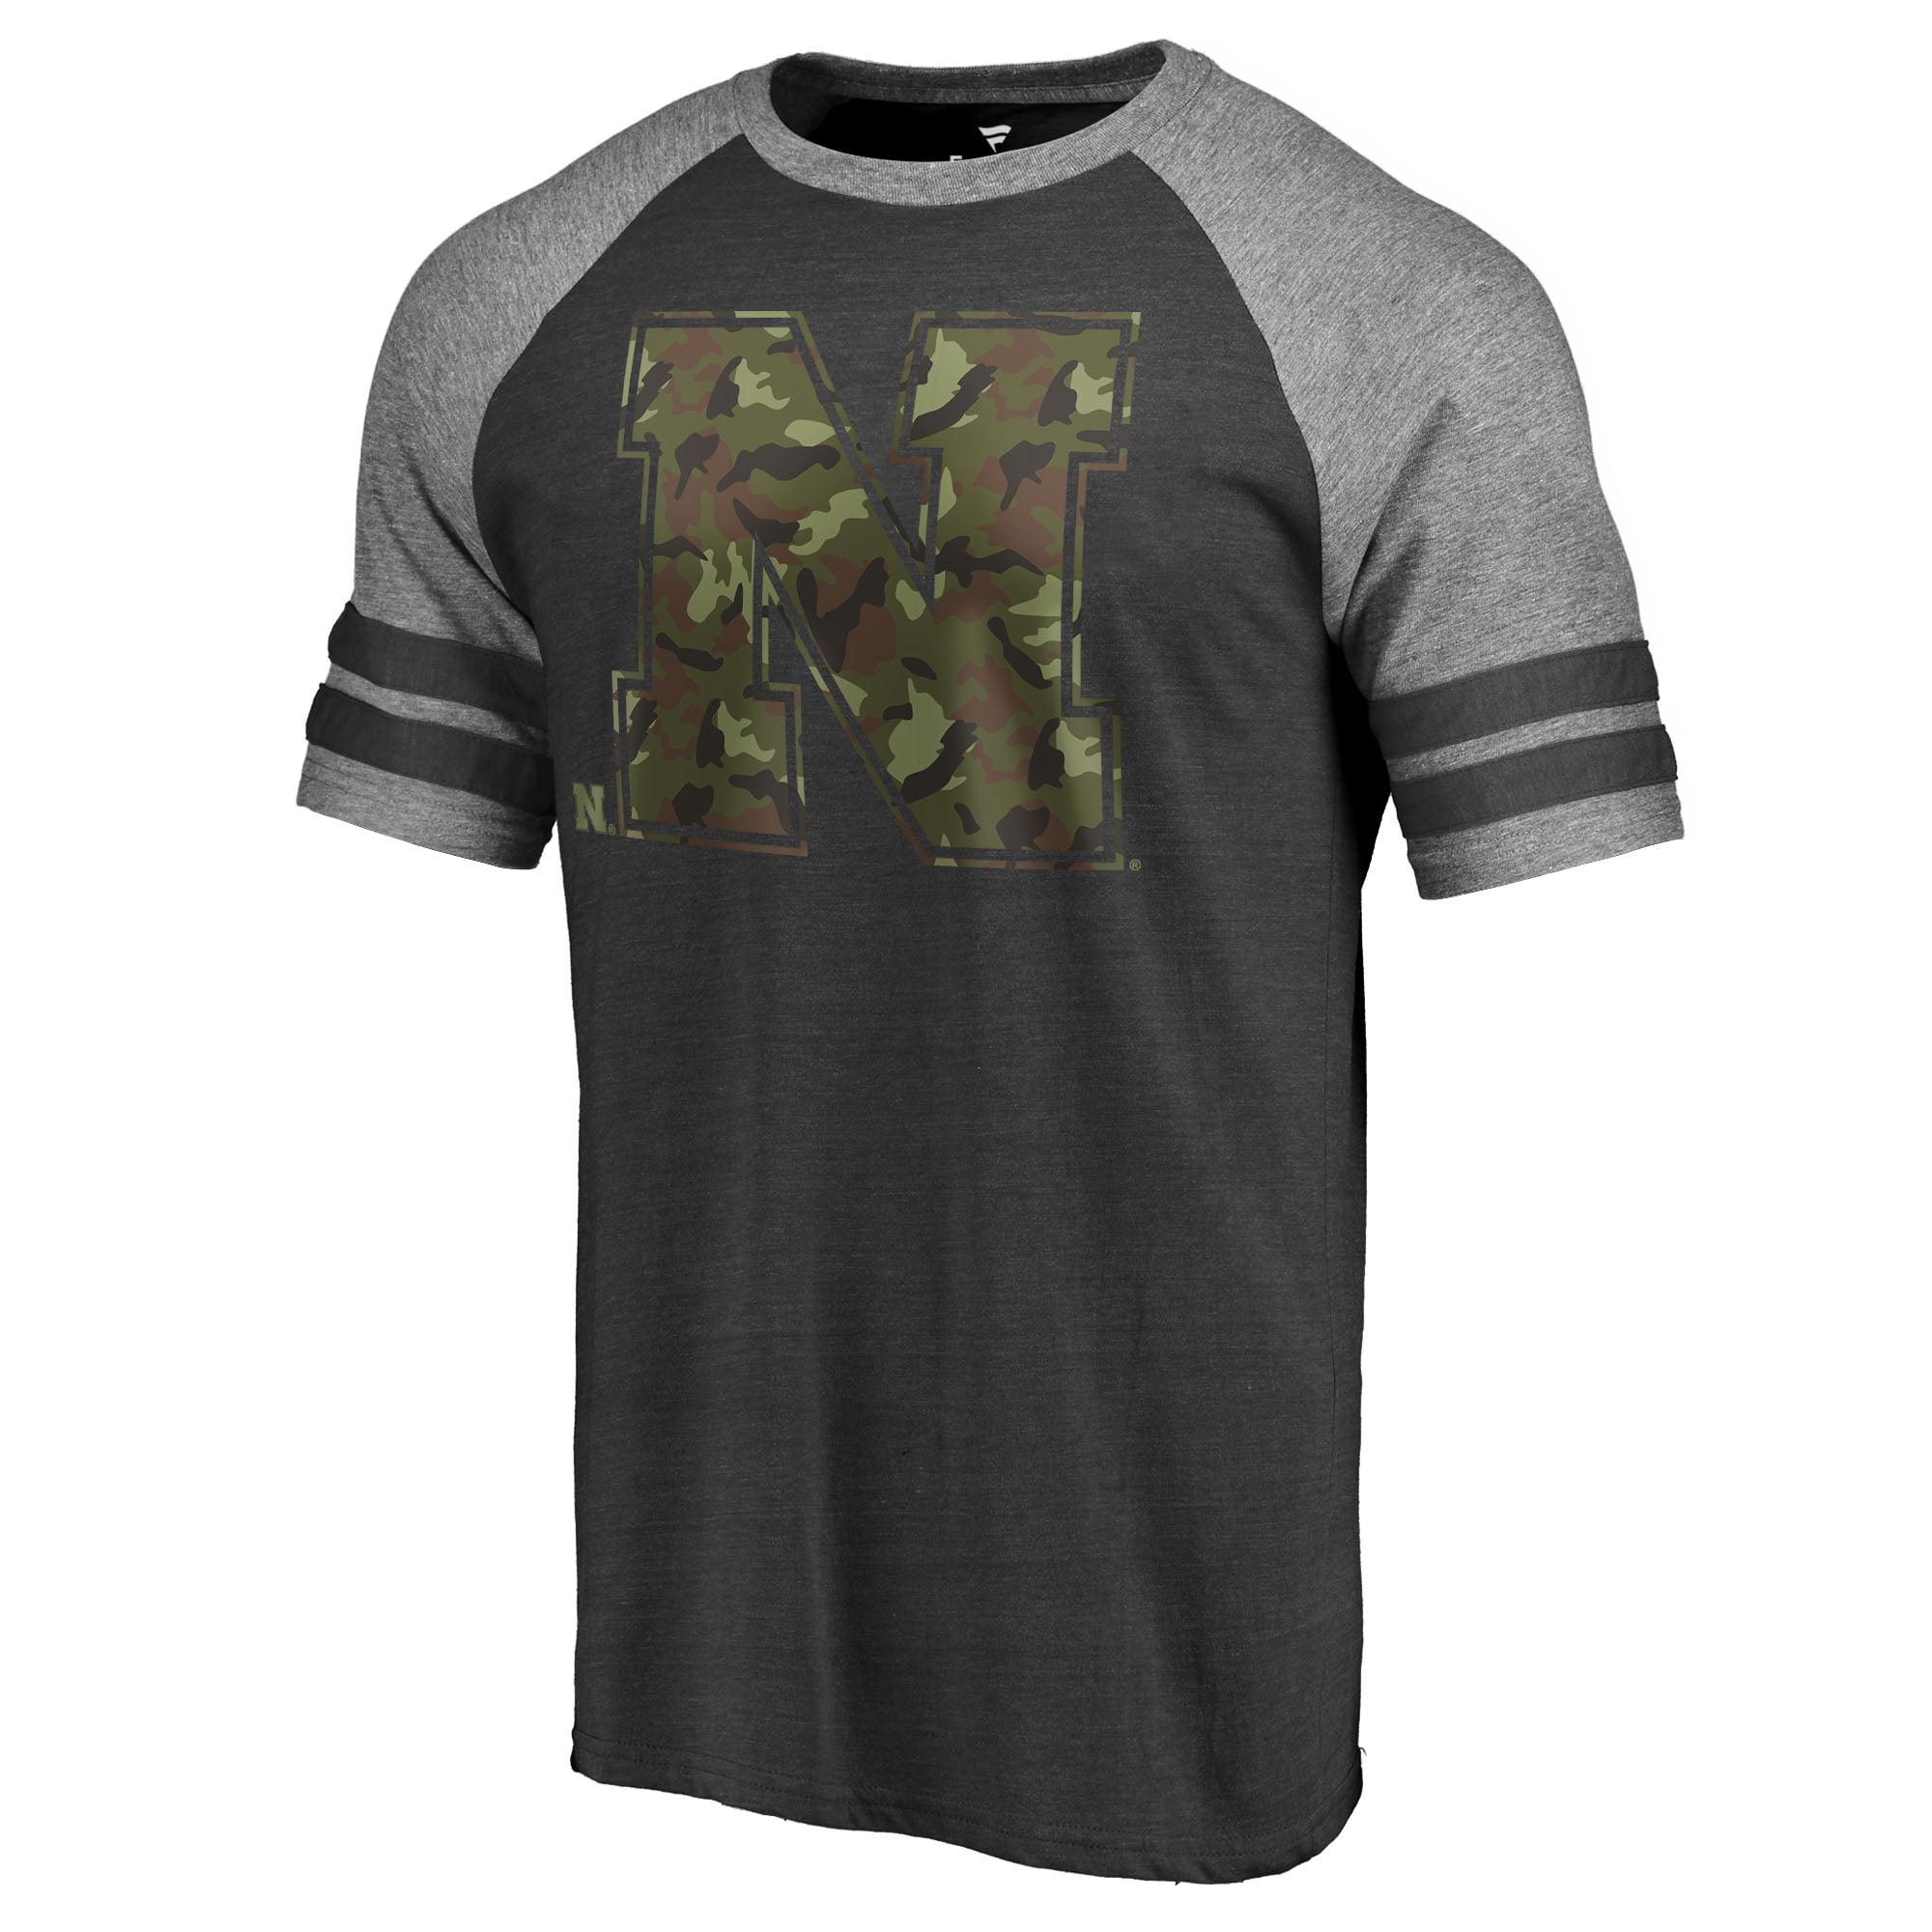 8e73d269a Nebraska Cornhuskers Fanatics Branded Prestige Stripe Raglan T-Shirt - Black  - Walmart.com